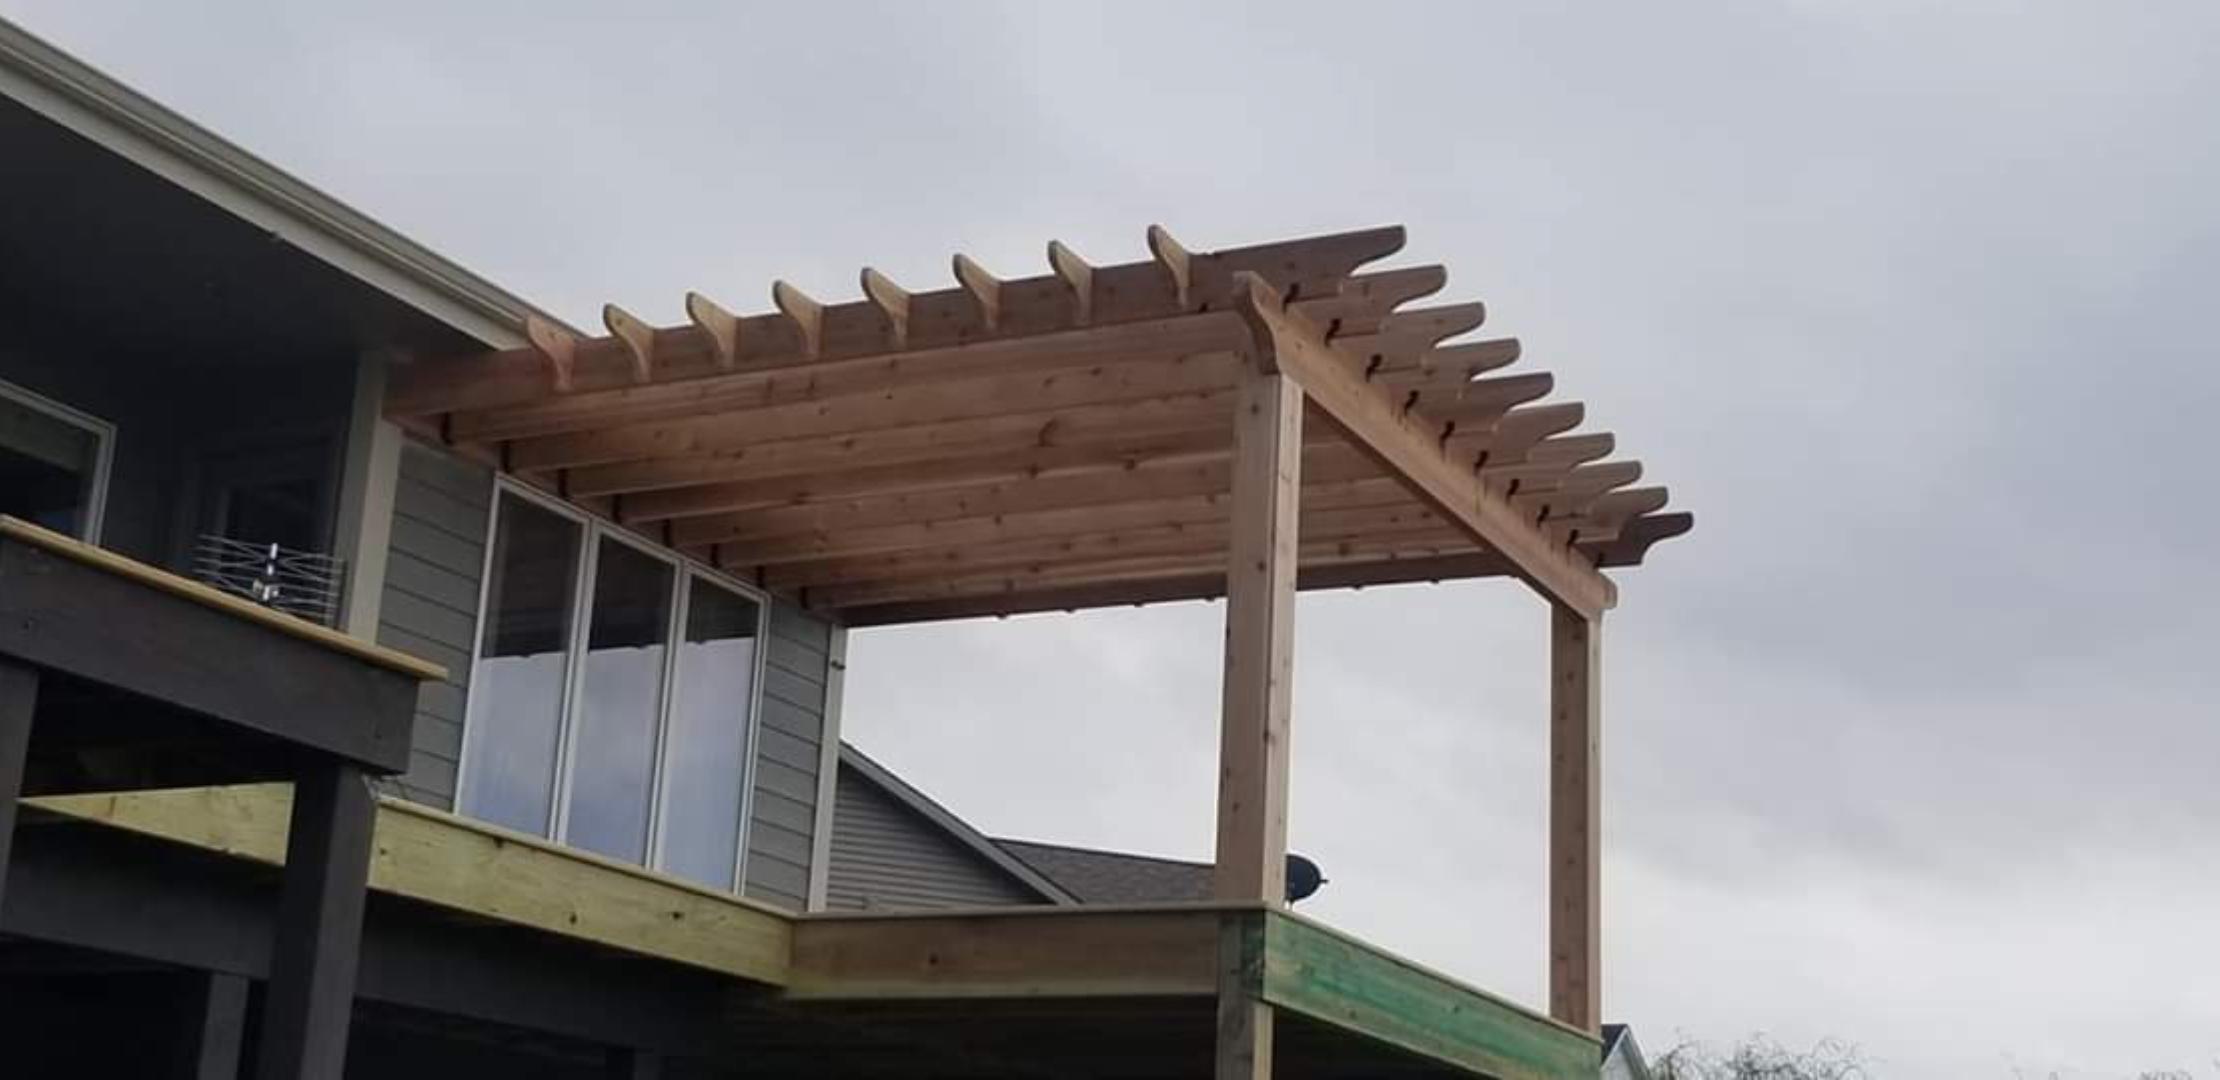 Peoria Tile and Carpenters image 8